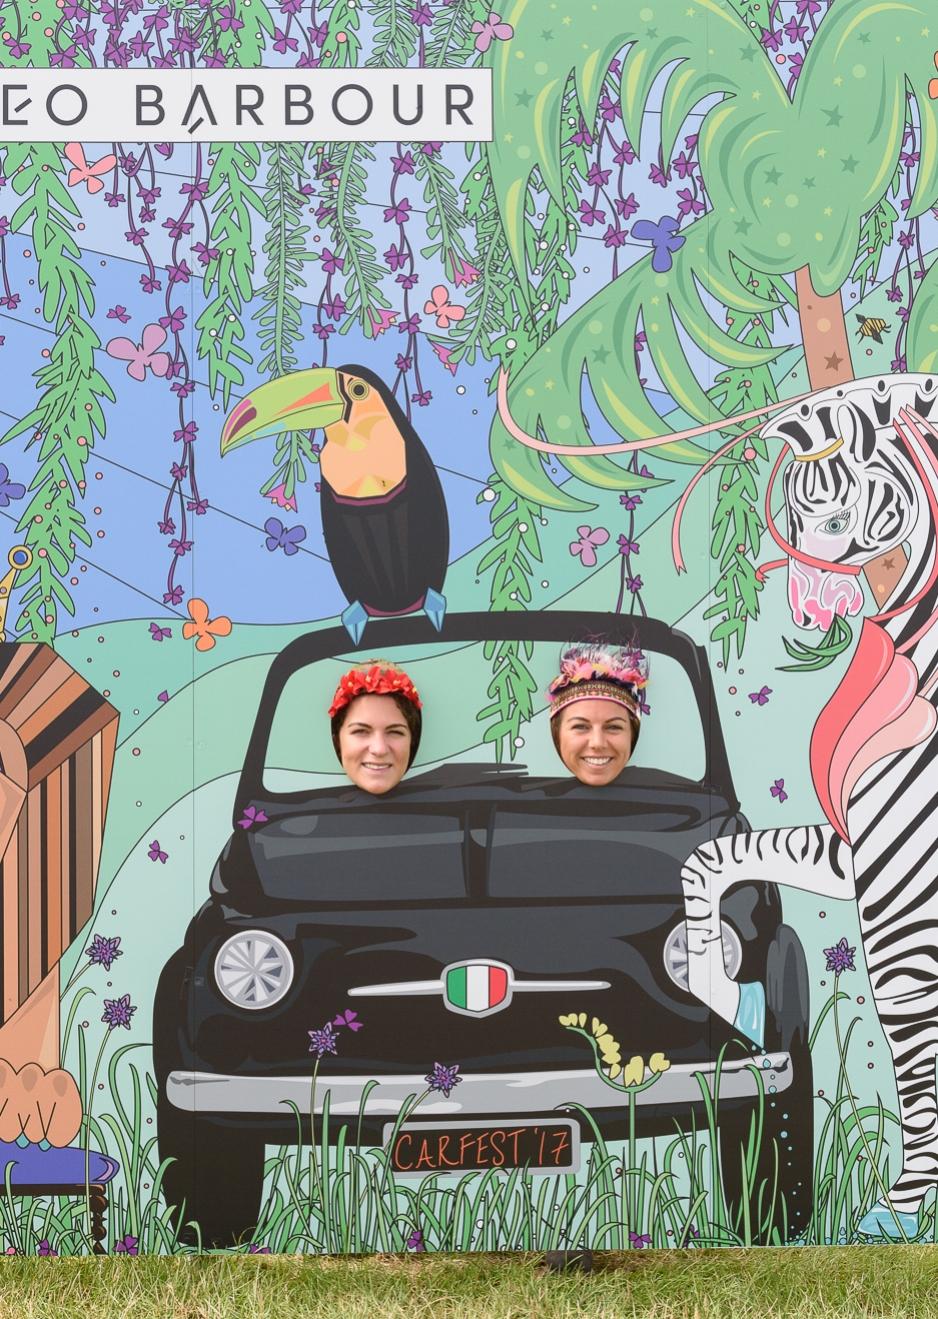 peep-board-carfest-tropical